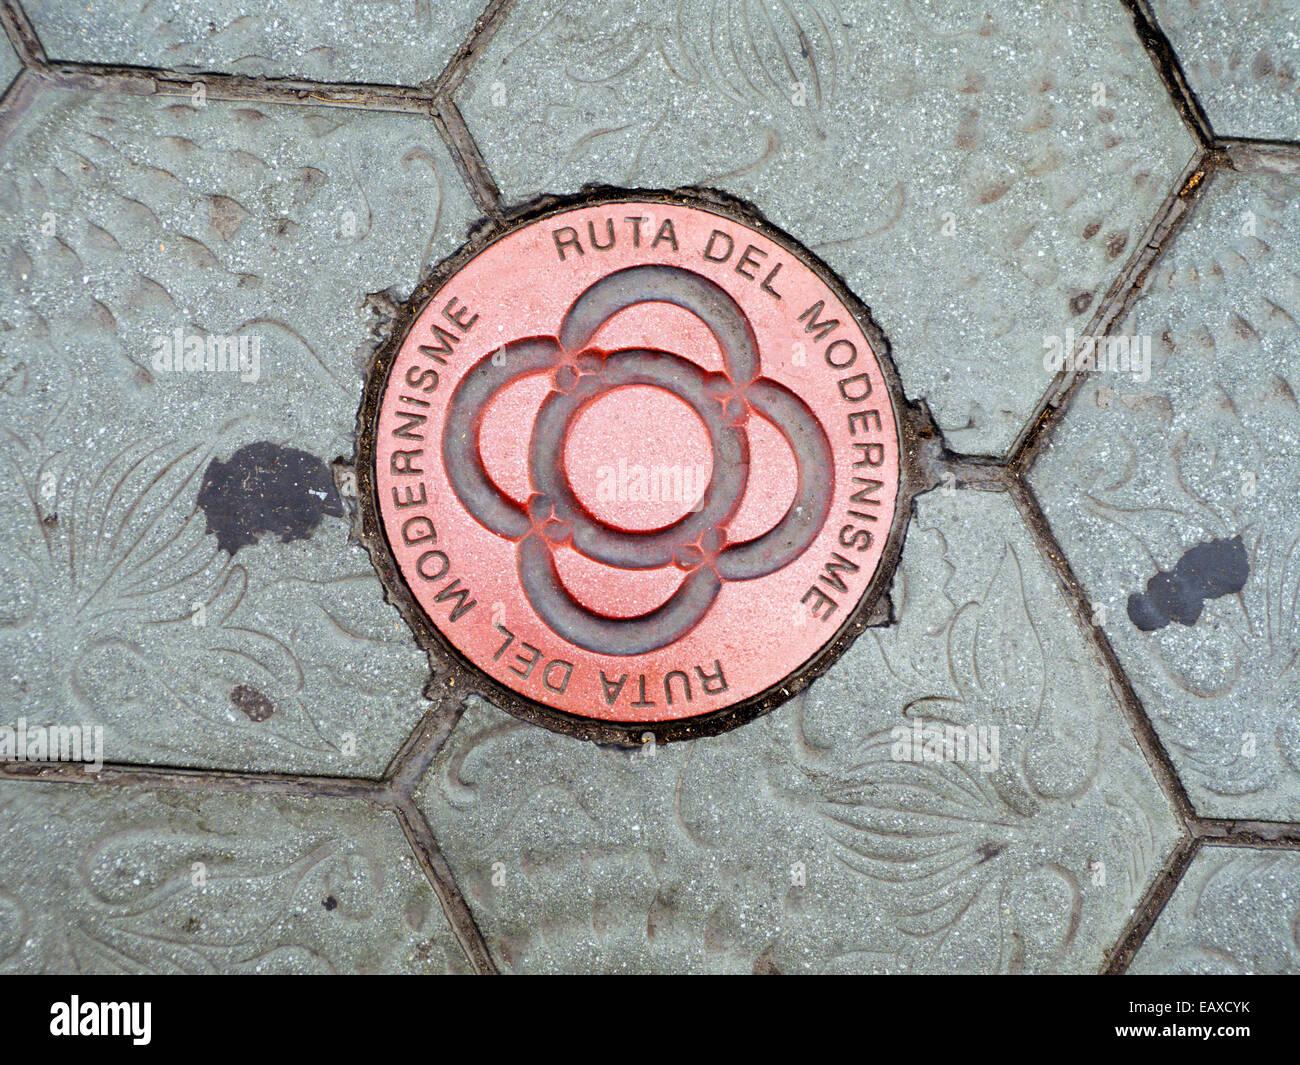 Spain Catalonia Barcelona Ruta Del Modernisme Modernisme route of Barcelona - Stock Image